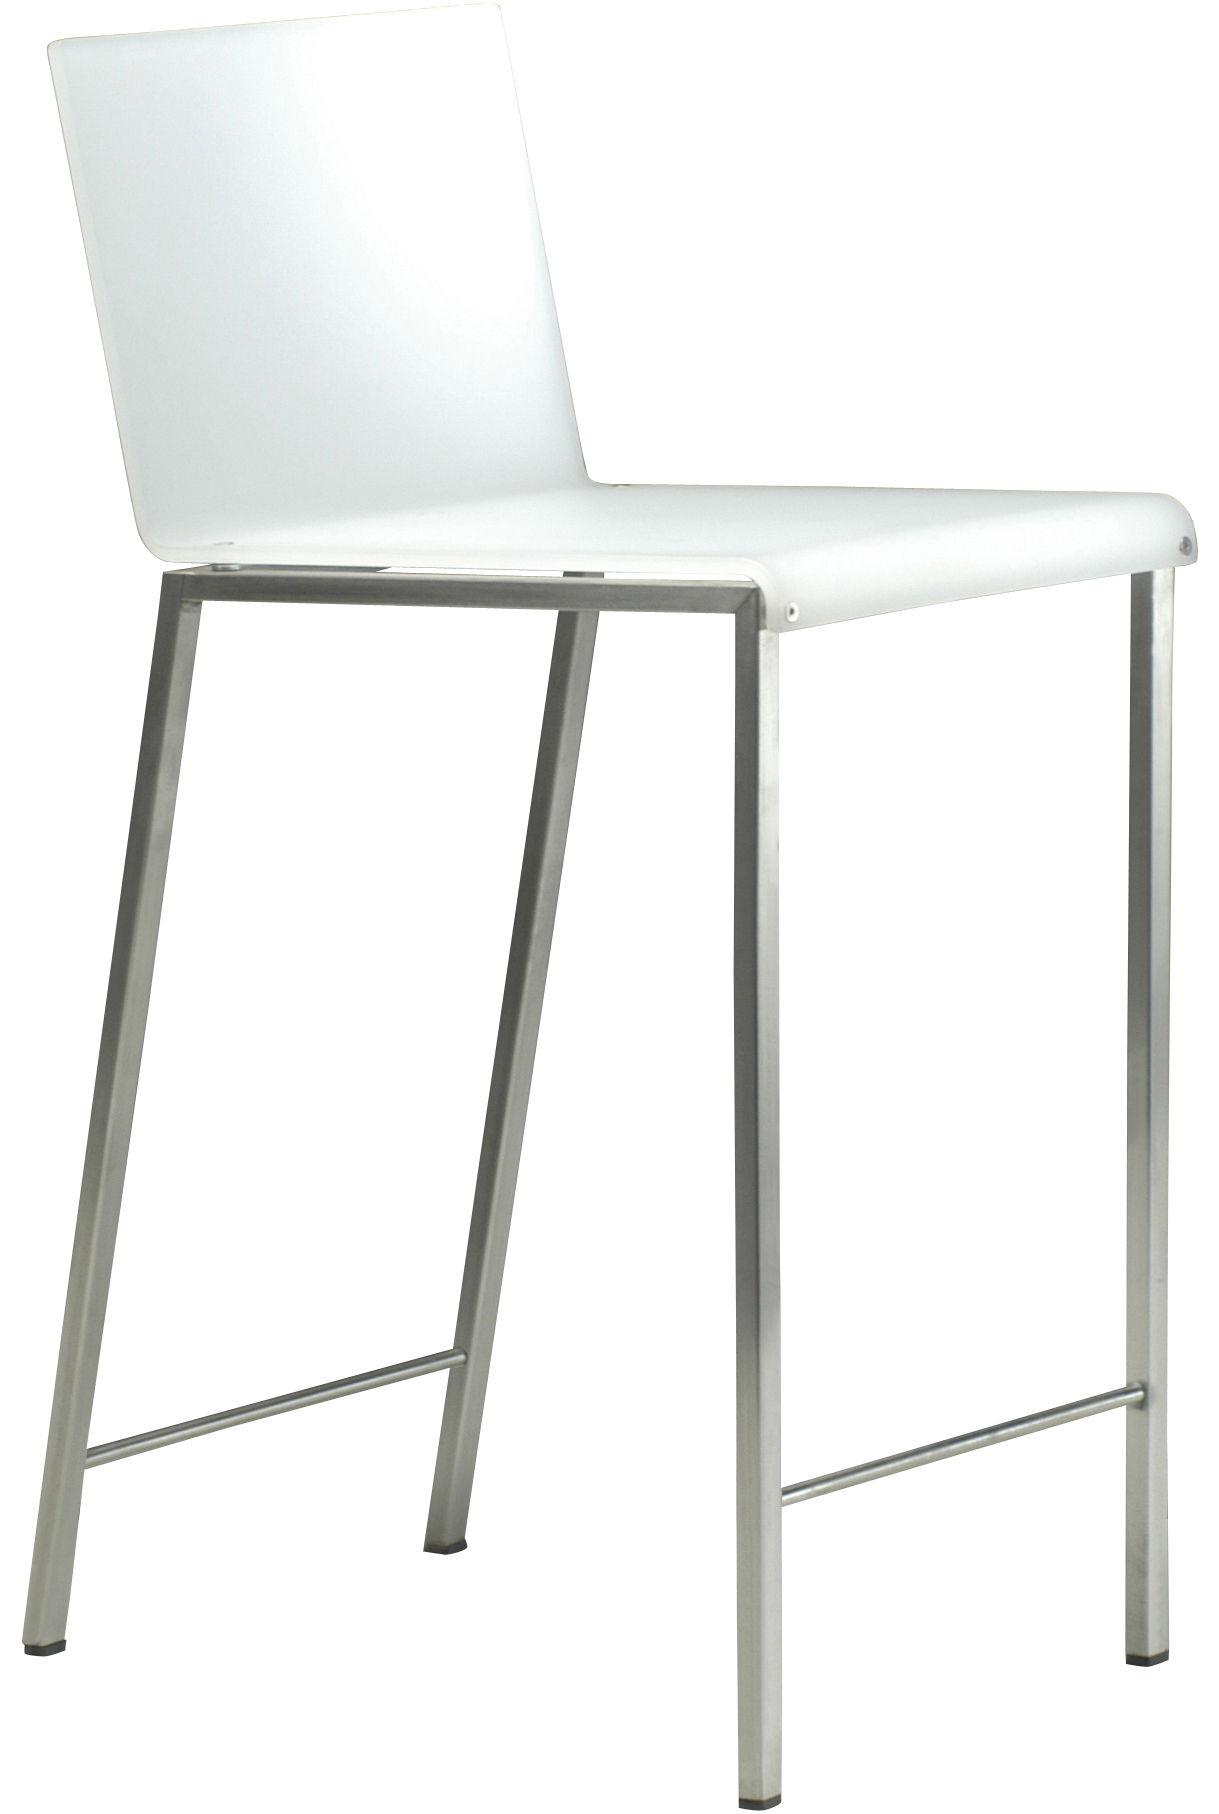 Arredamento - Sgabelli da bar  - Sedia da bar Bianco - Tinta opaca di Zeus - Bianco opalino h seduta 64 cm - Acciaio sabbiato, Resina acrilica